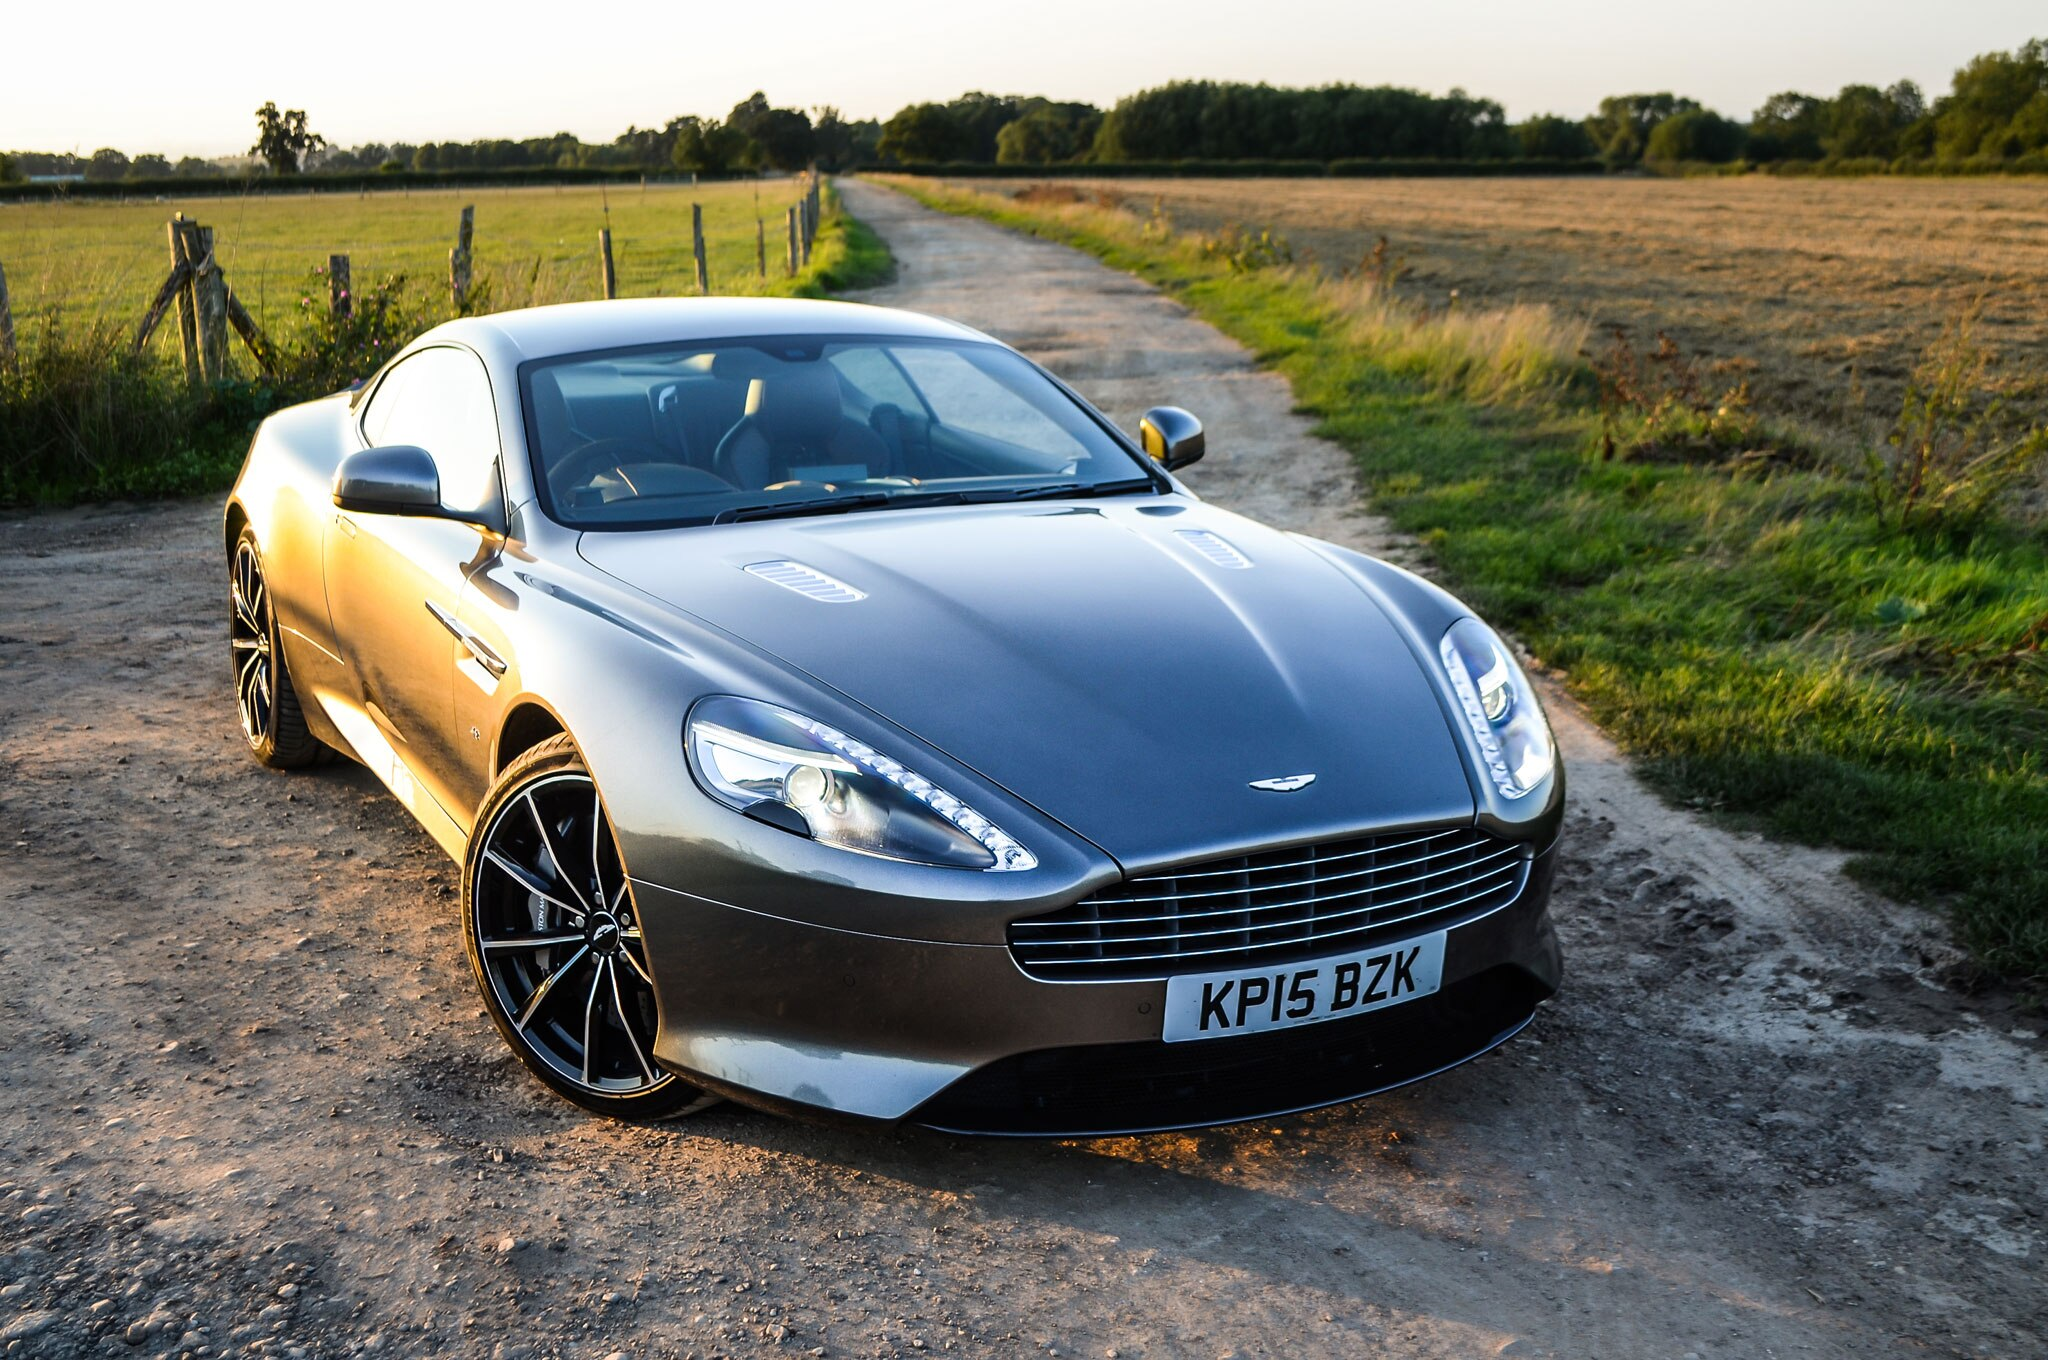 2016 Aston Martin Db9 Gt Review